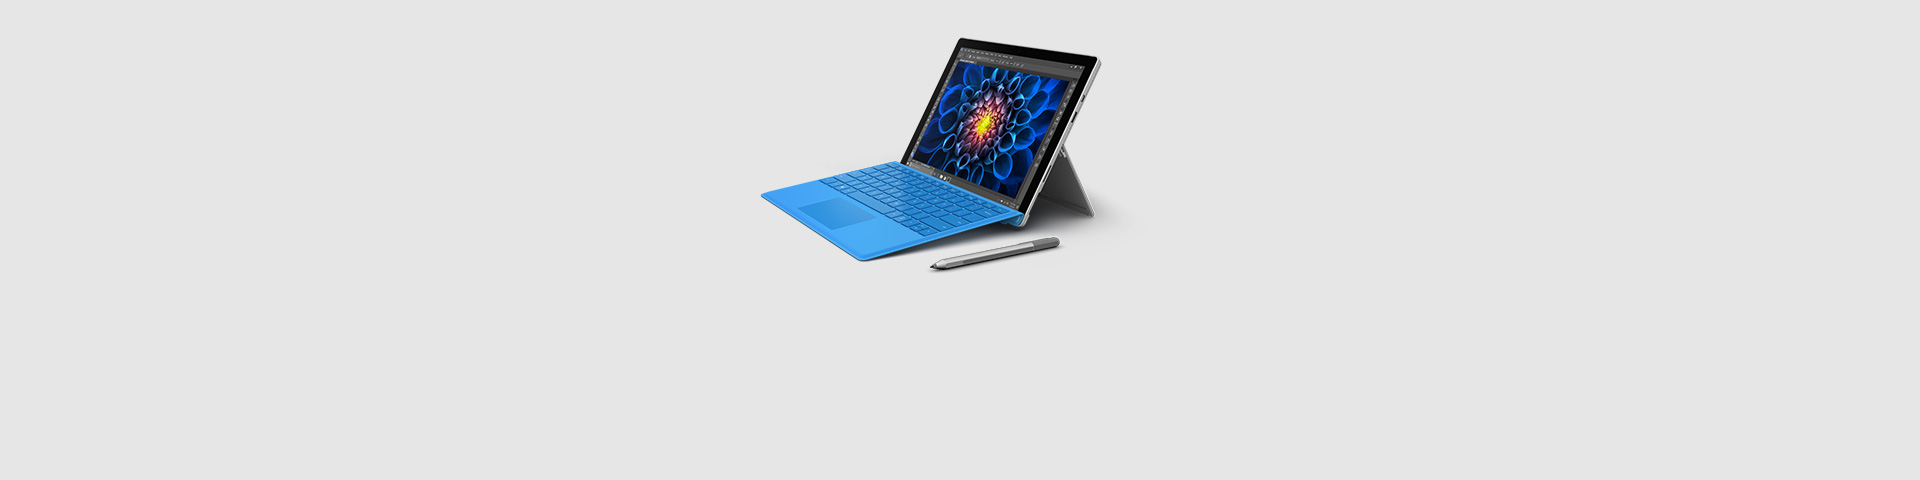 Surface Pro 4 장치